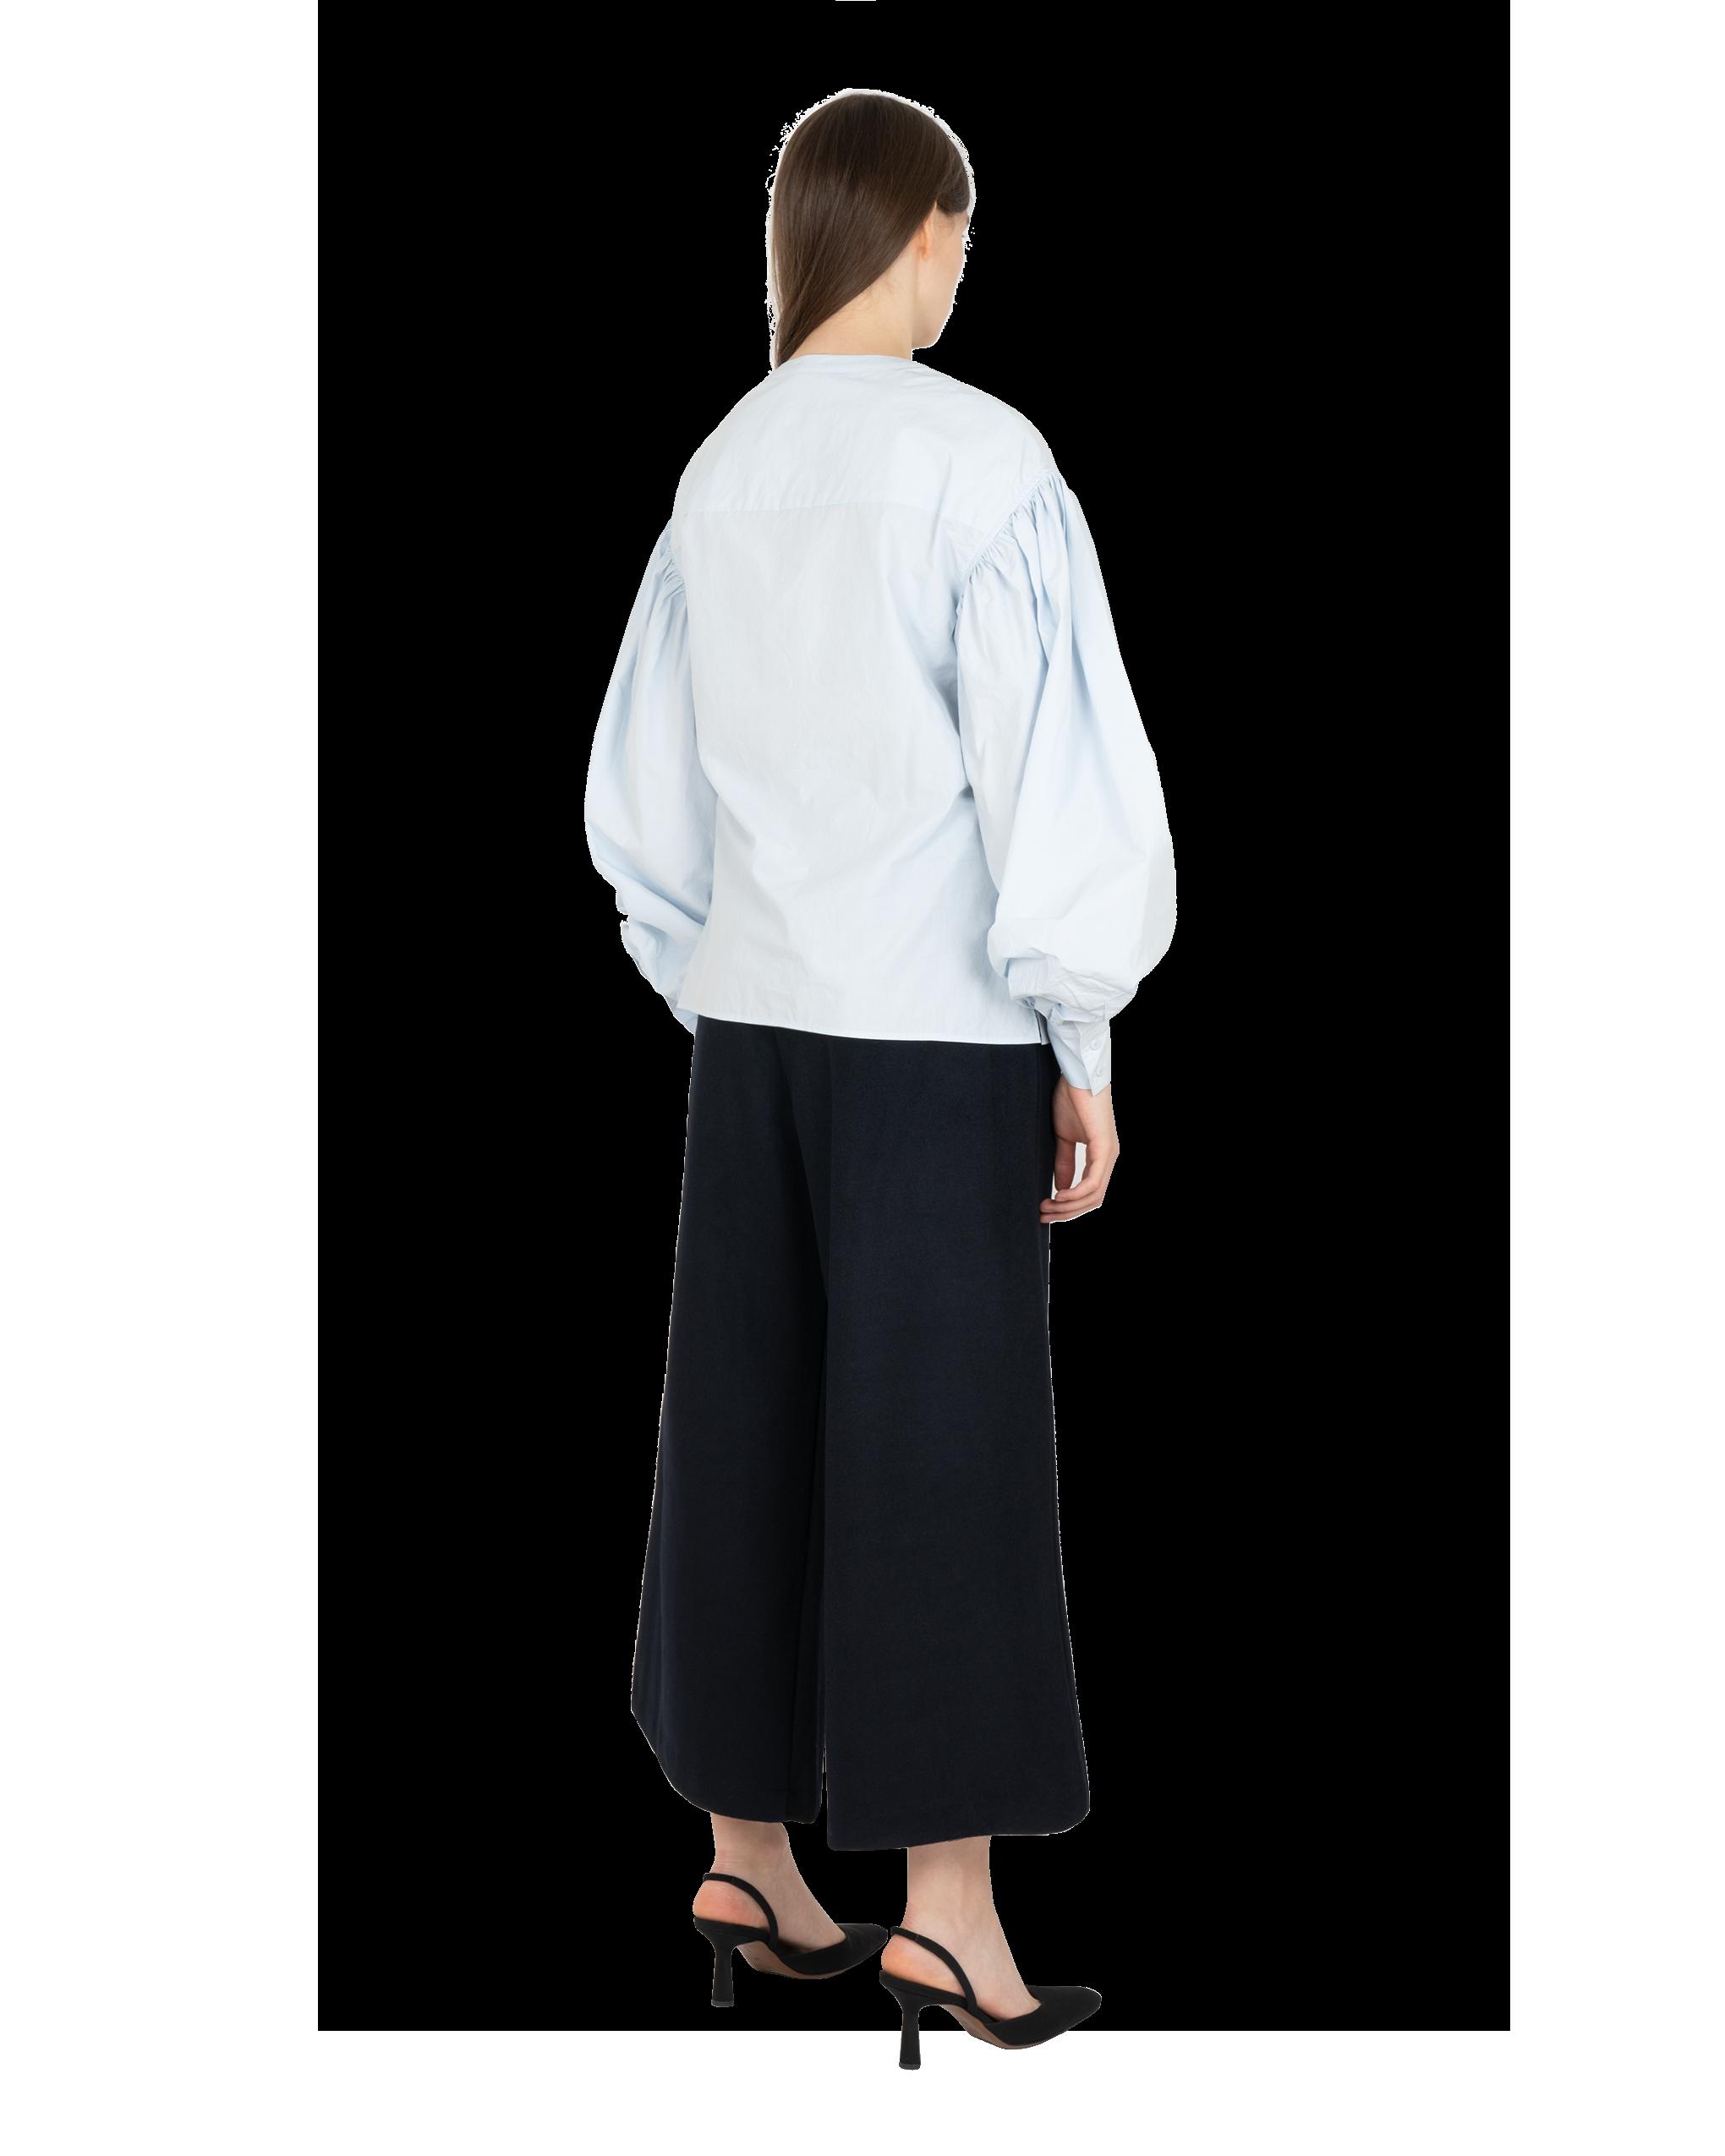 Model wearing EMIN + PAUL sky cinched illusion shirt.